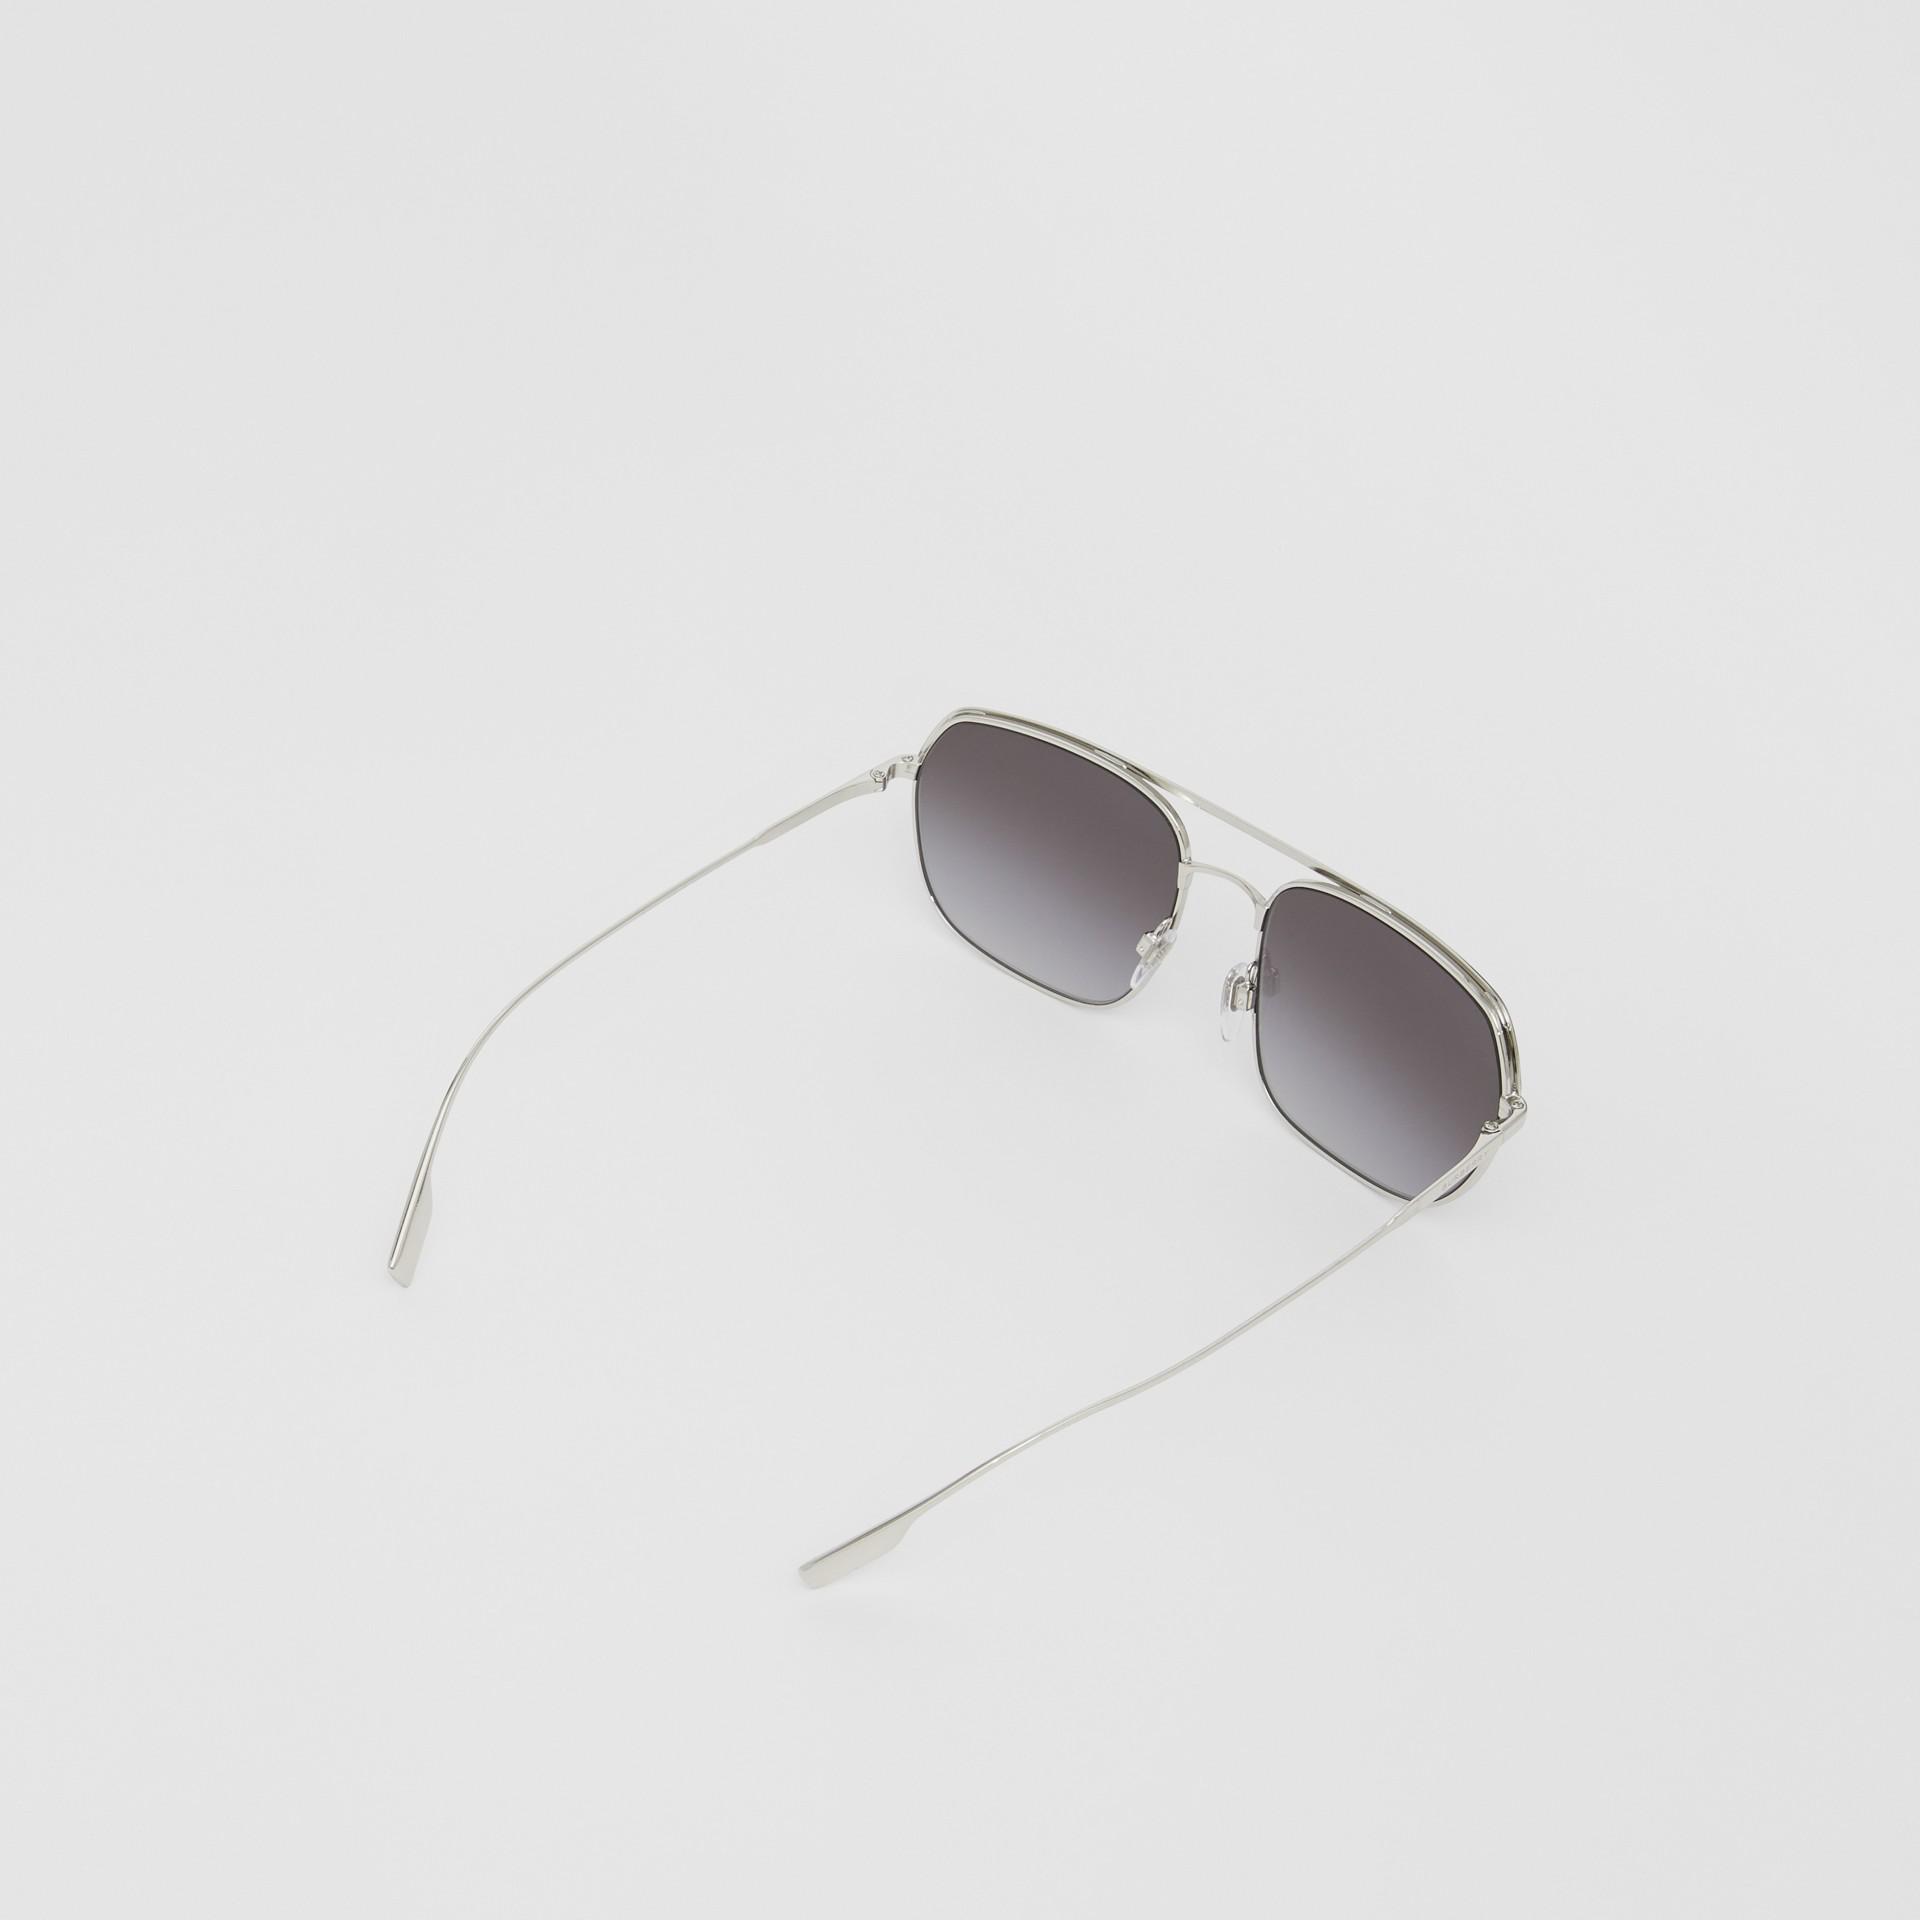 Square Pilot Sunglasses in Black - Men | Burberry - gallery image 3